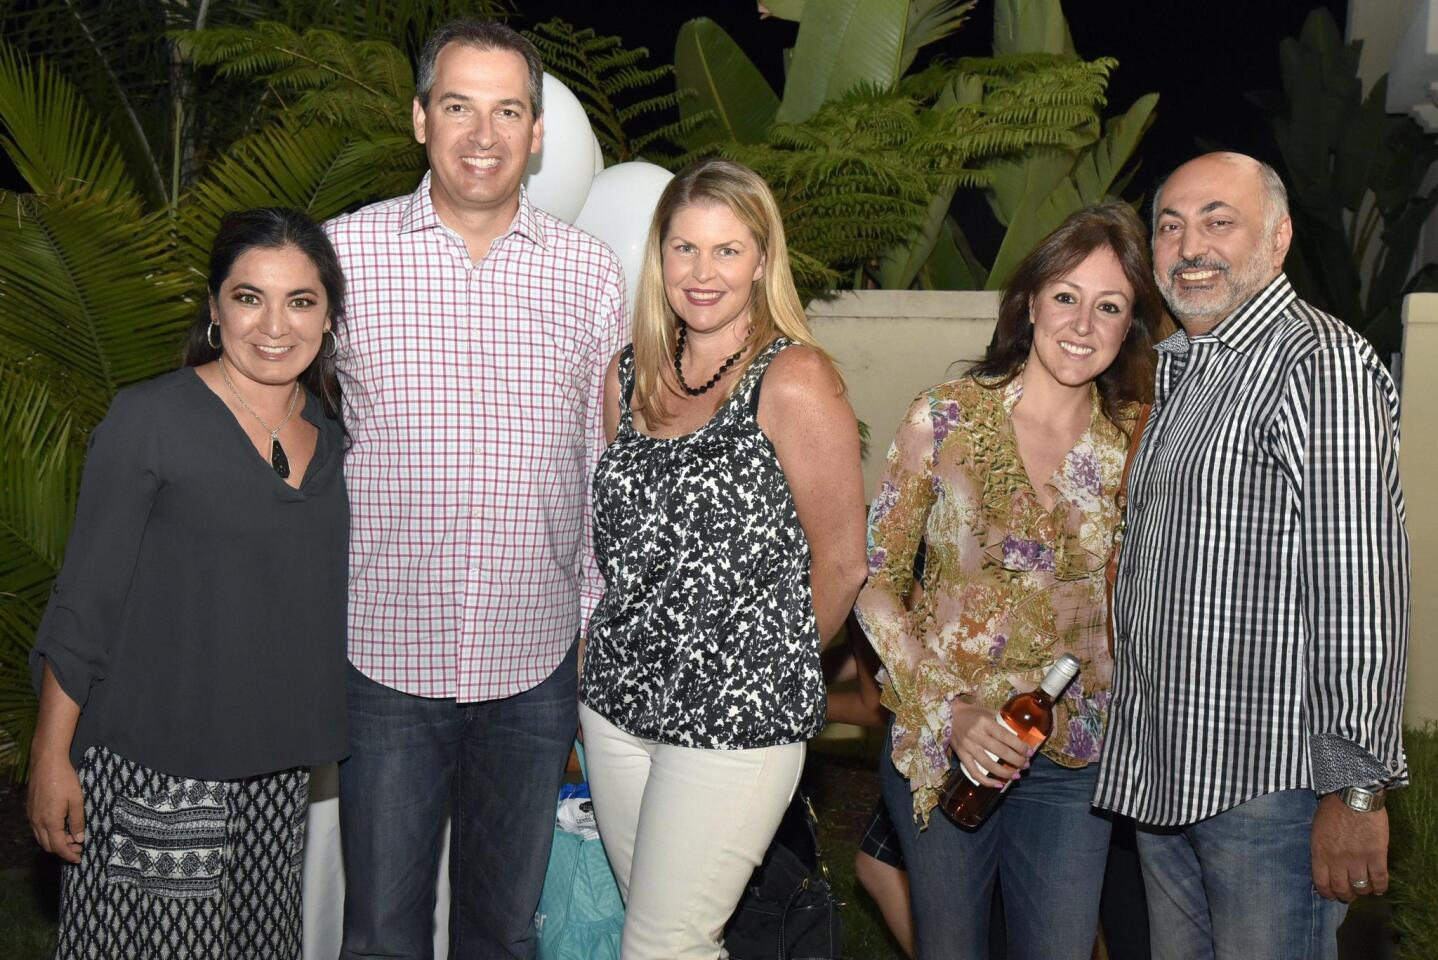 Sarai Marcelin, Jon and Natalie McPheters, Kathy and Robert Yasmeh